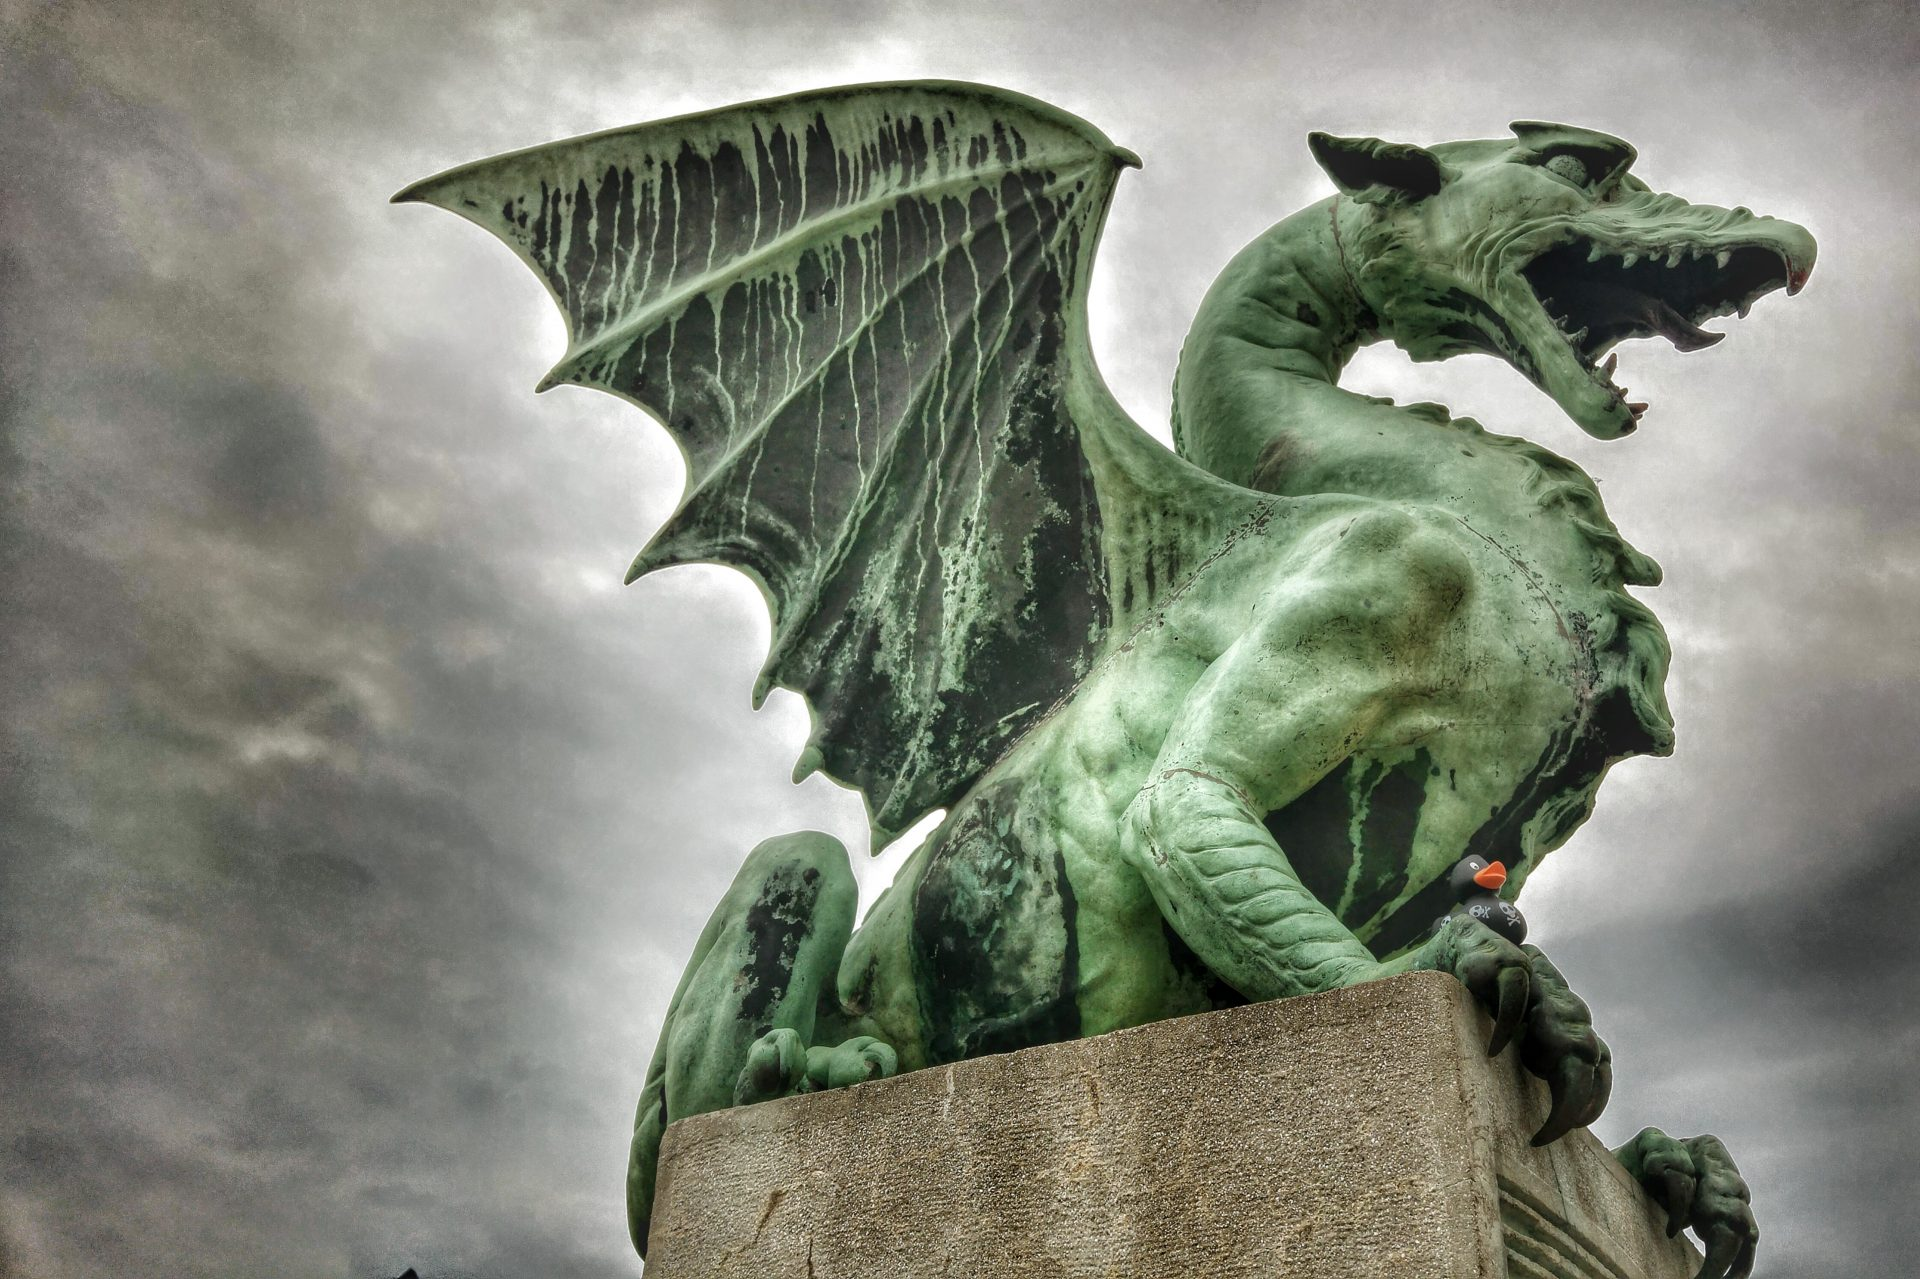 Dragon city and Proteus kingdom